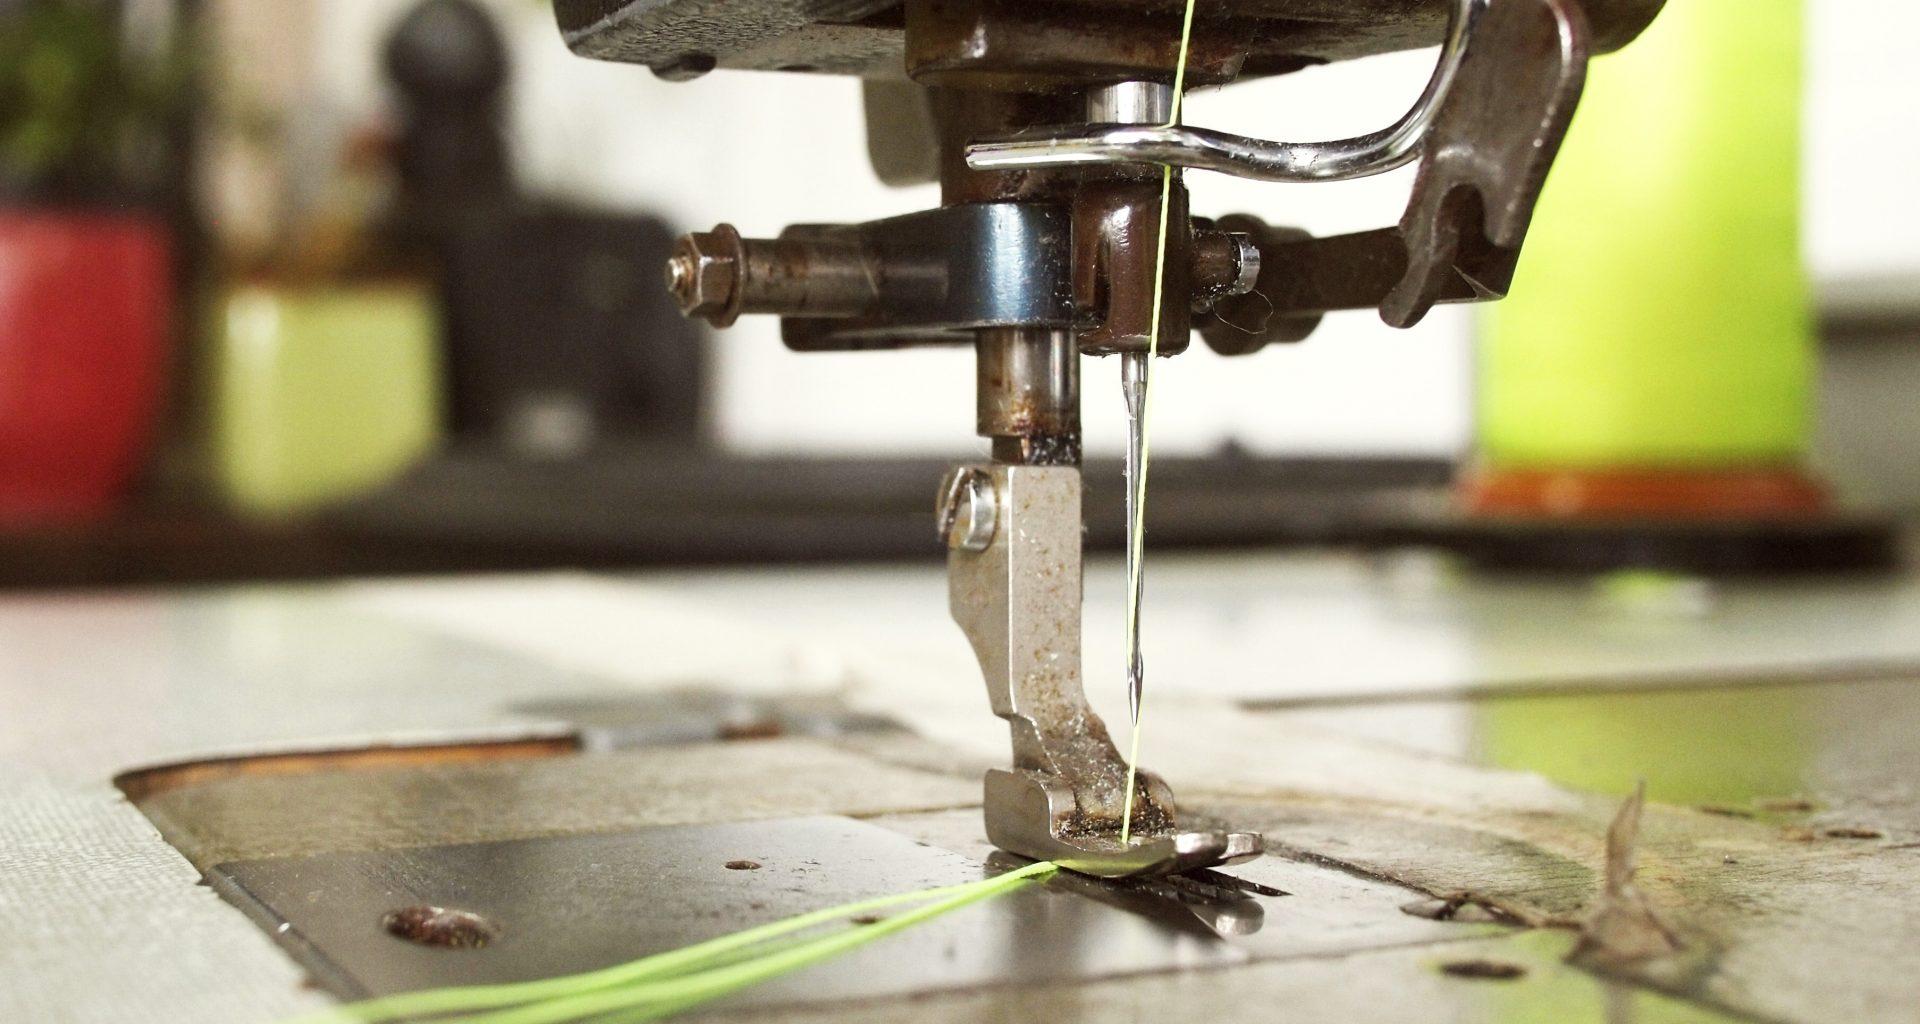 yellow thread on sewing machine